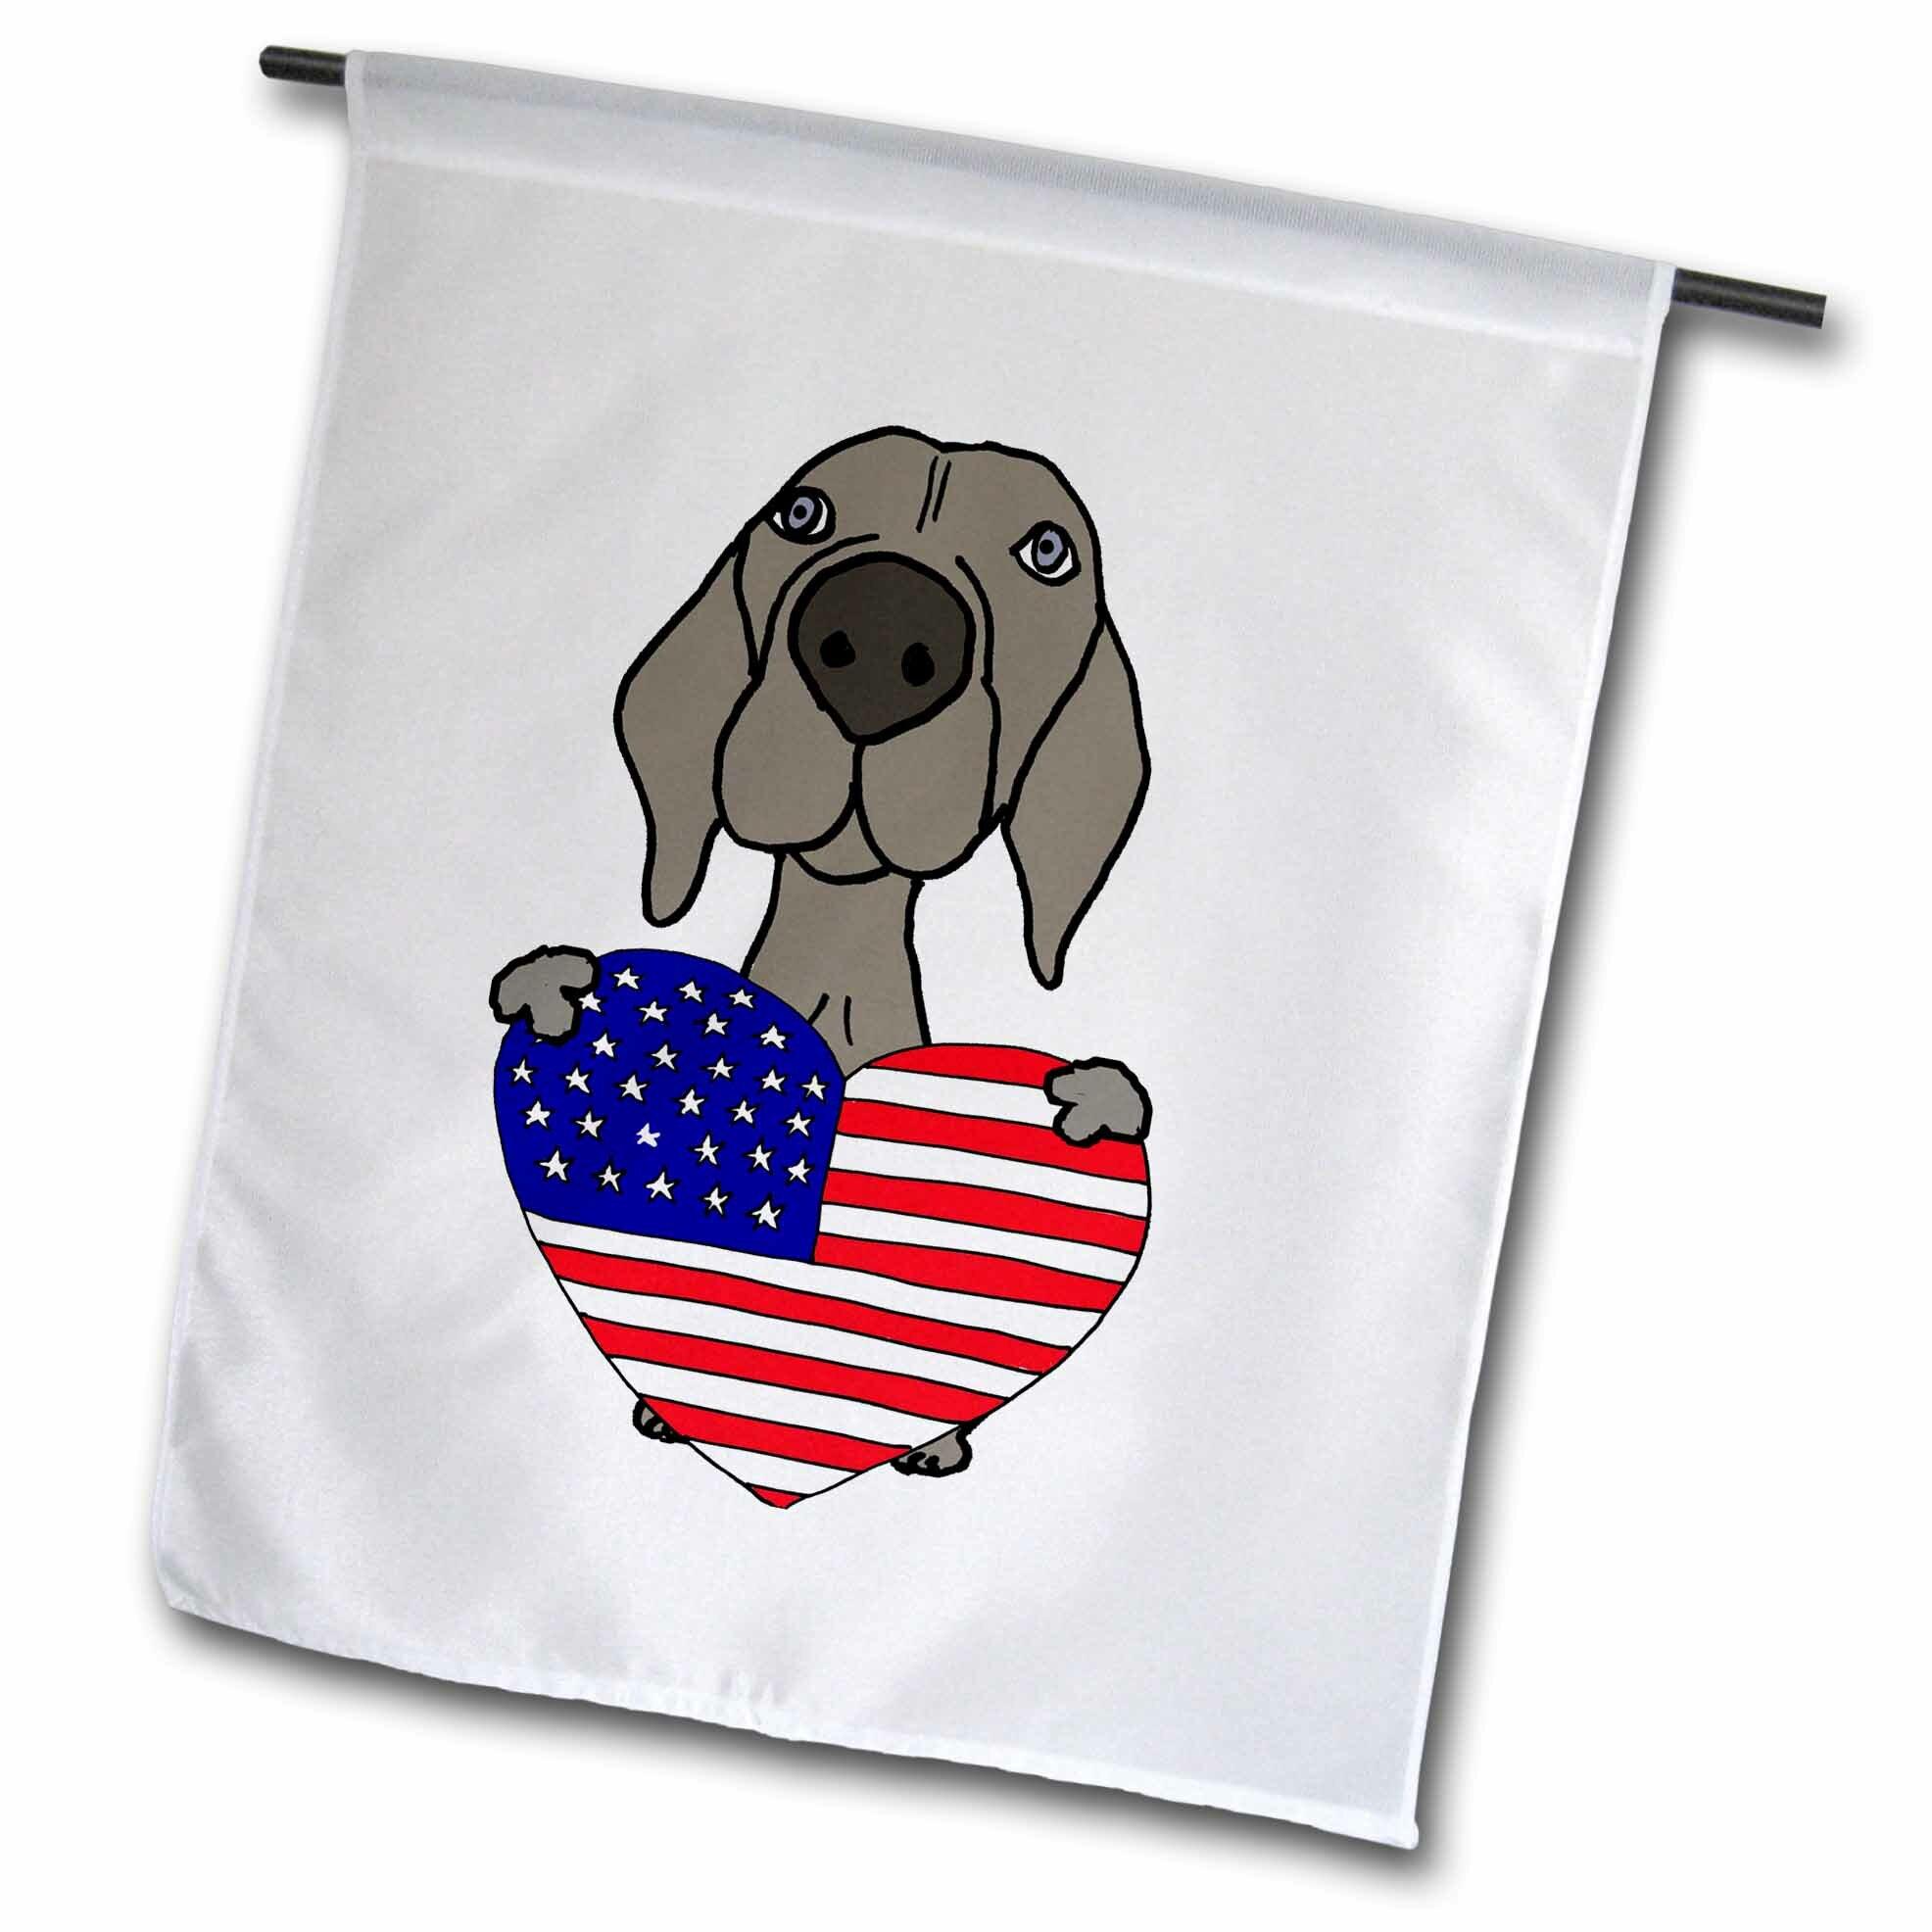 3drose Funny Cute Weimaraner Dog With American Heart Polyester 18 X 12 In Garden Flag Wayfair